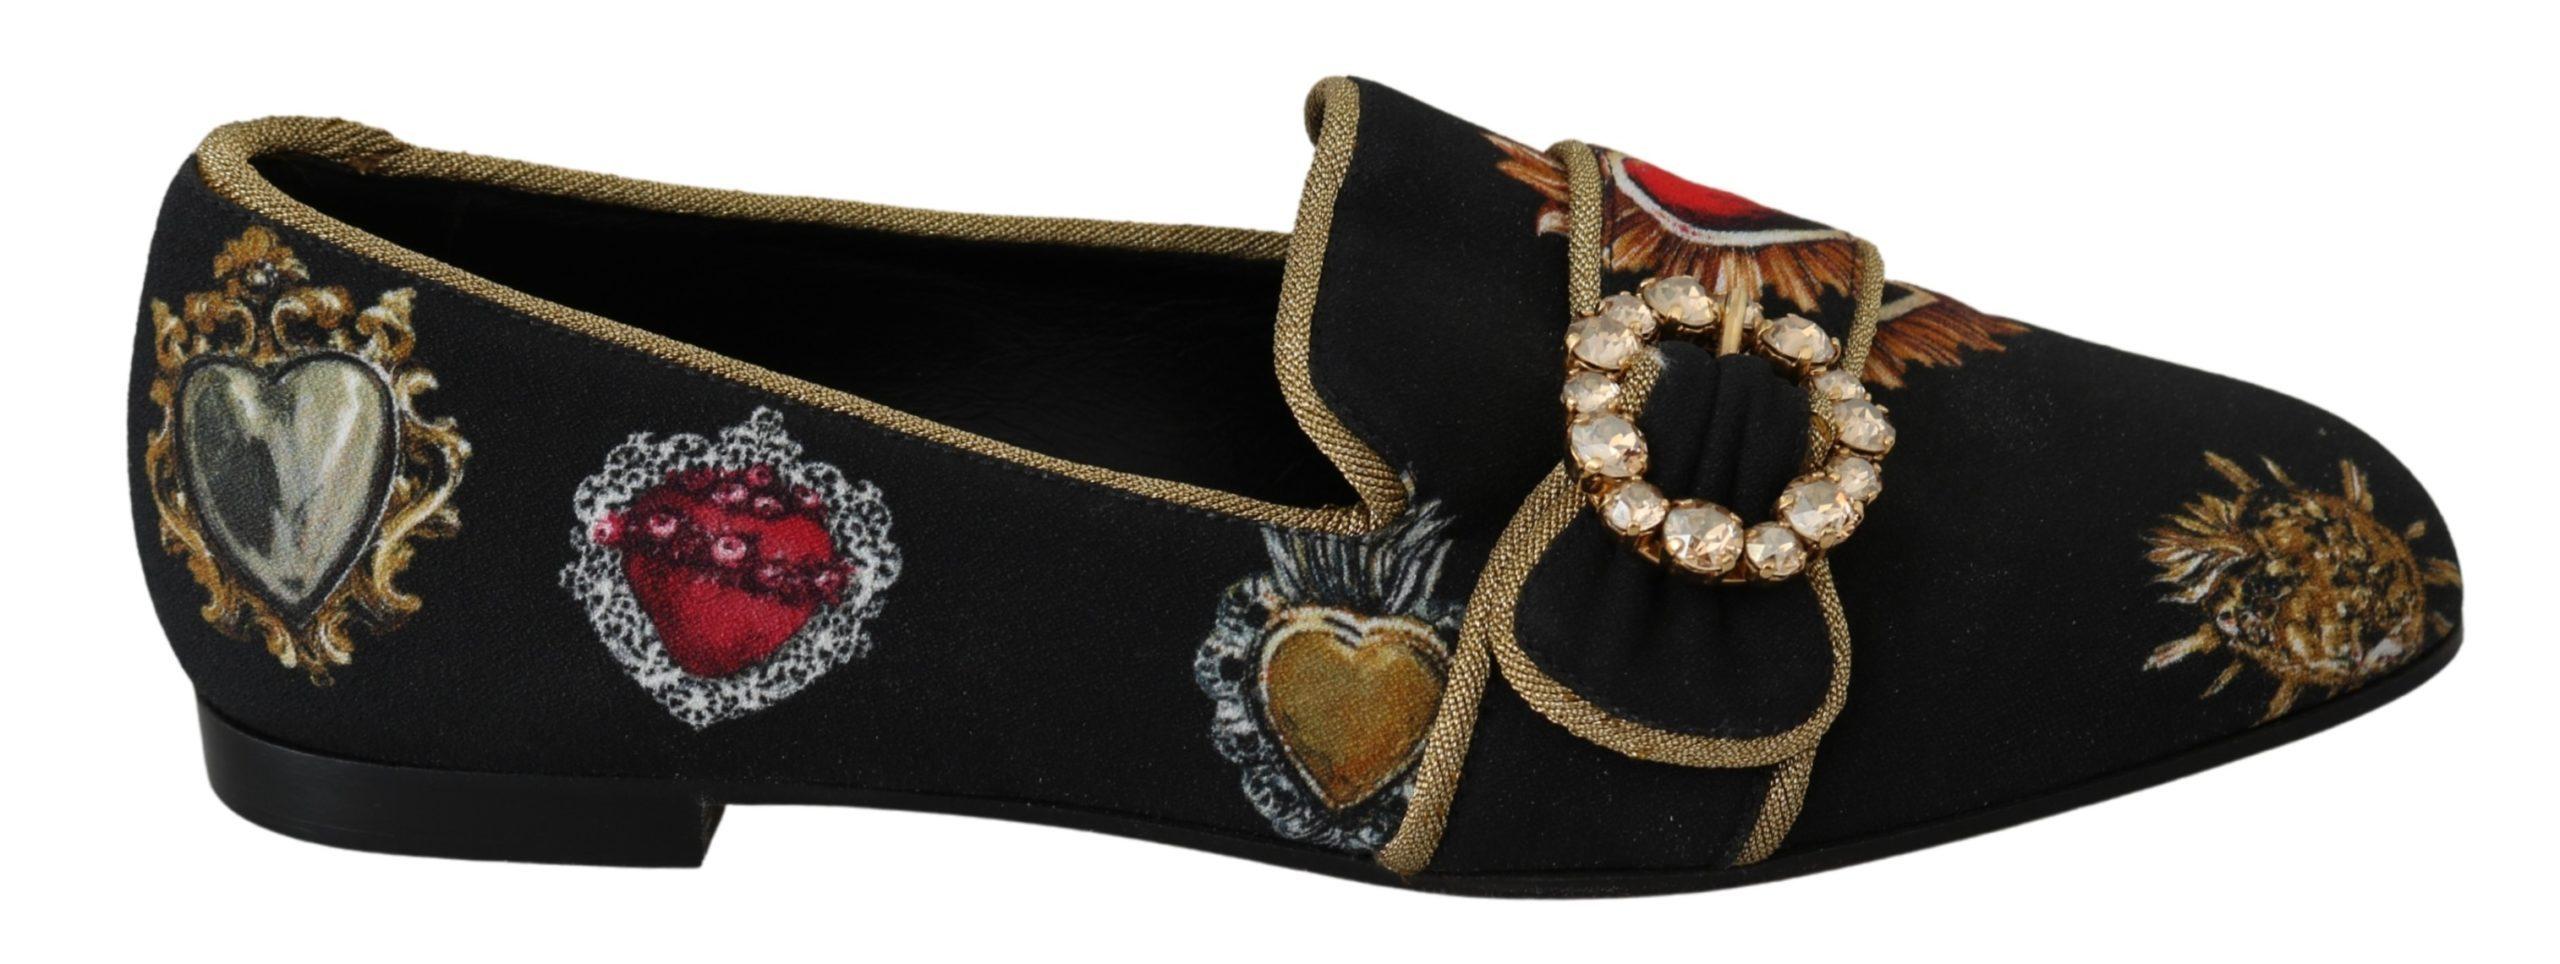 Dolce & Gabbana Women's Amore Heart Loafers Black LA6591 - EU35.5/US5